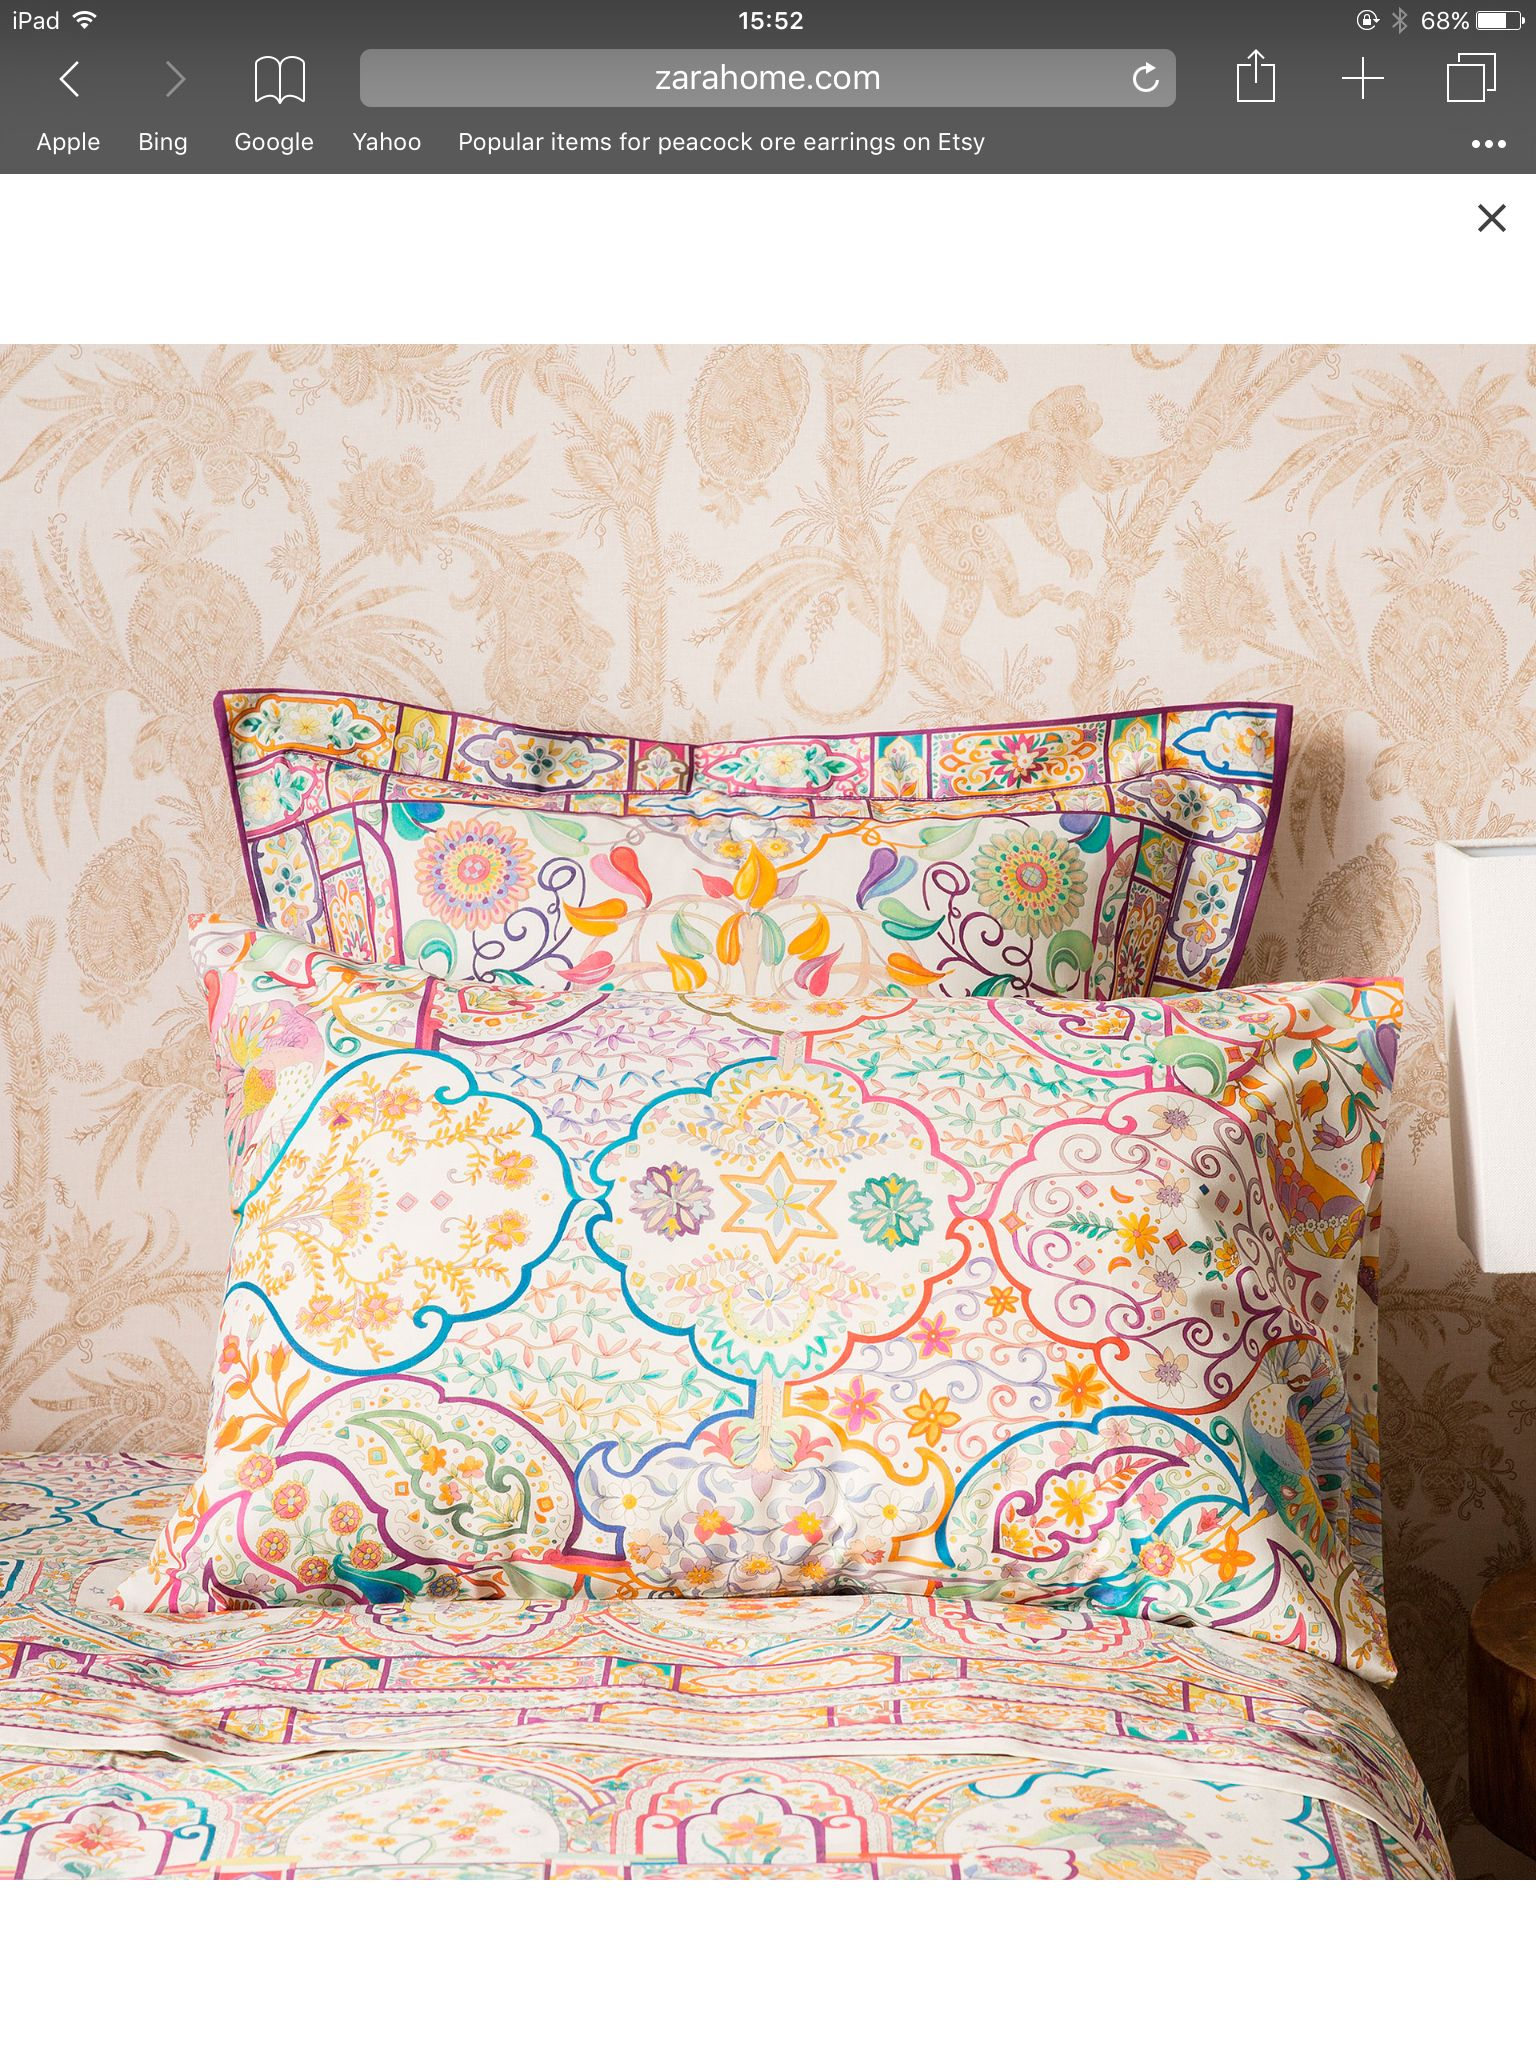 zara home pattern textures and print pinterest zara home